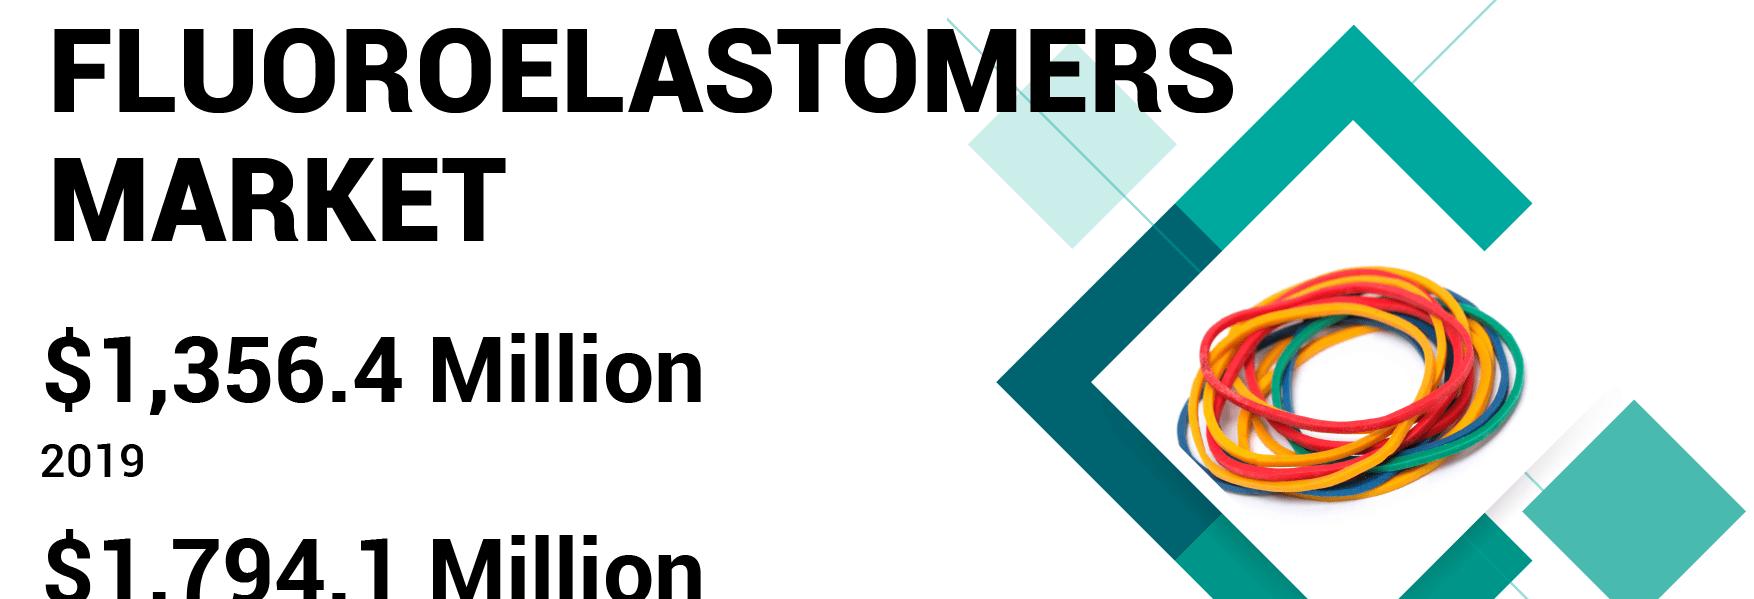 Fluoroelastomer Market